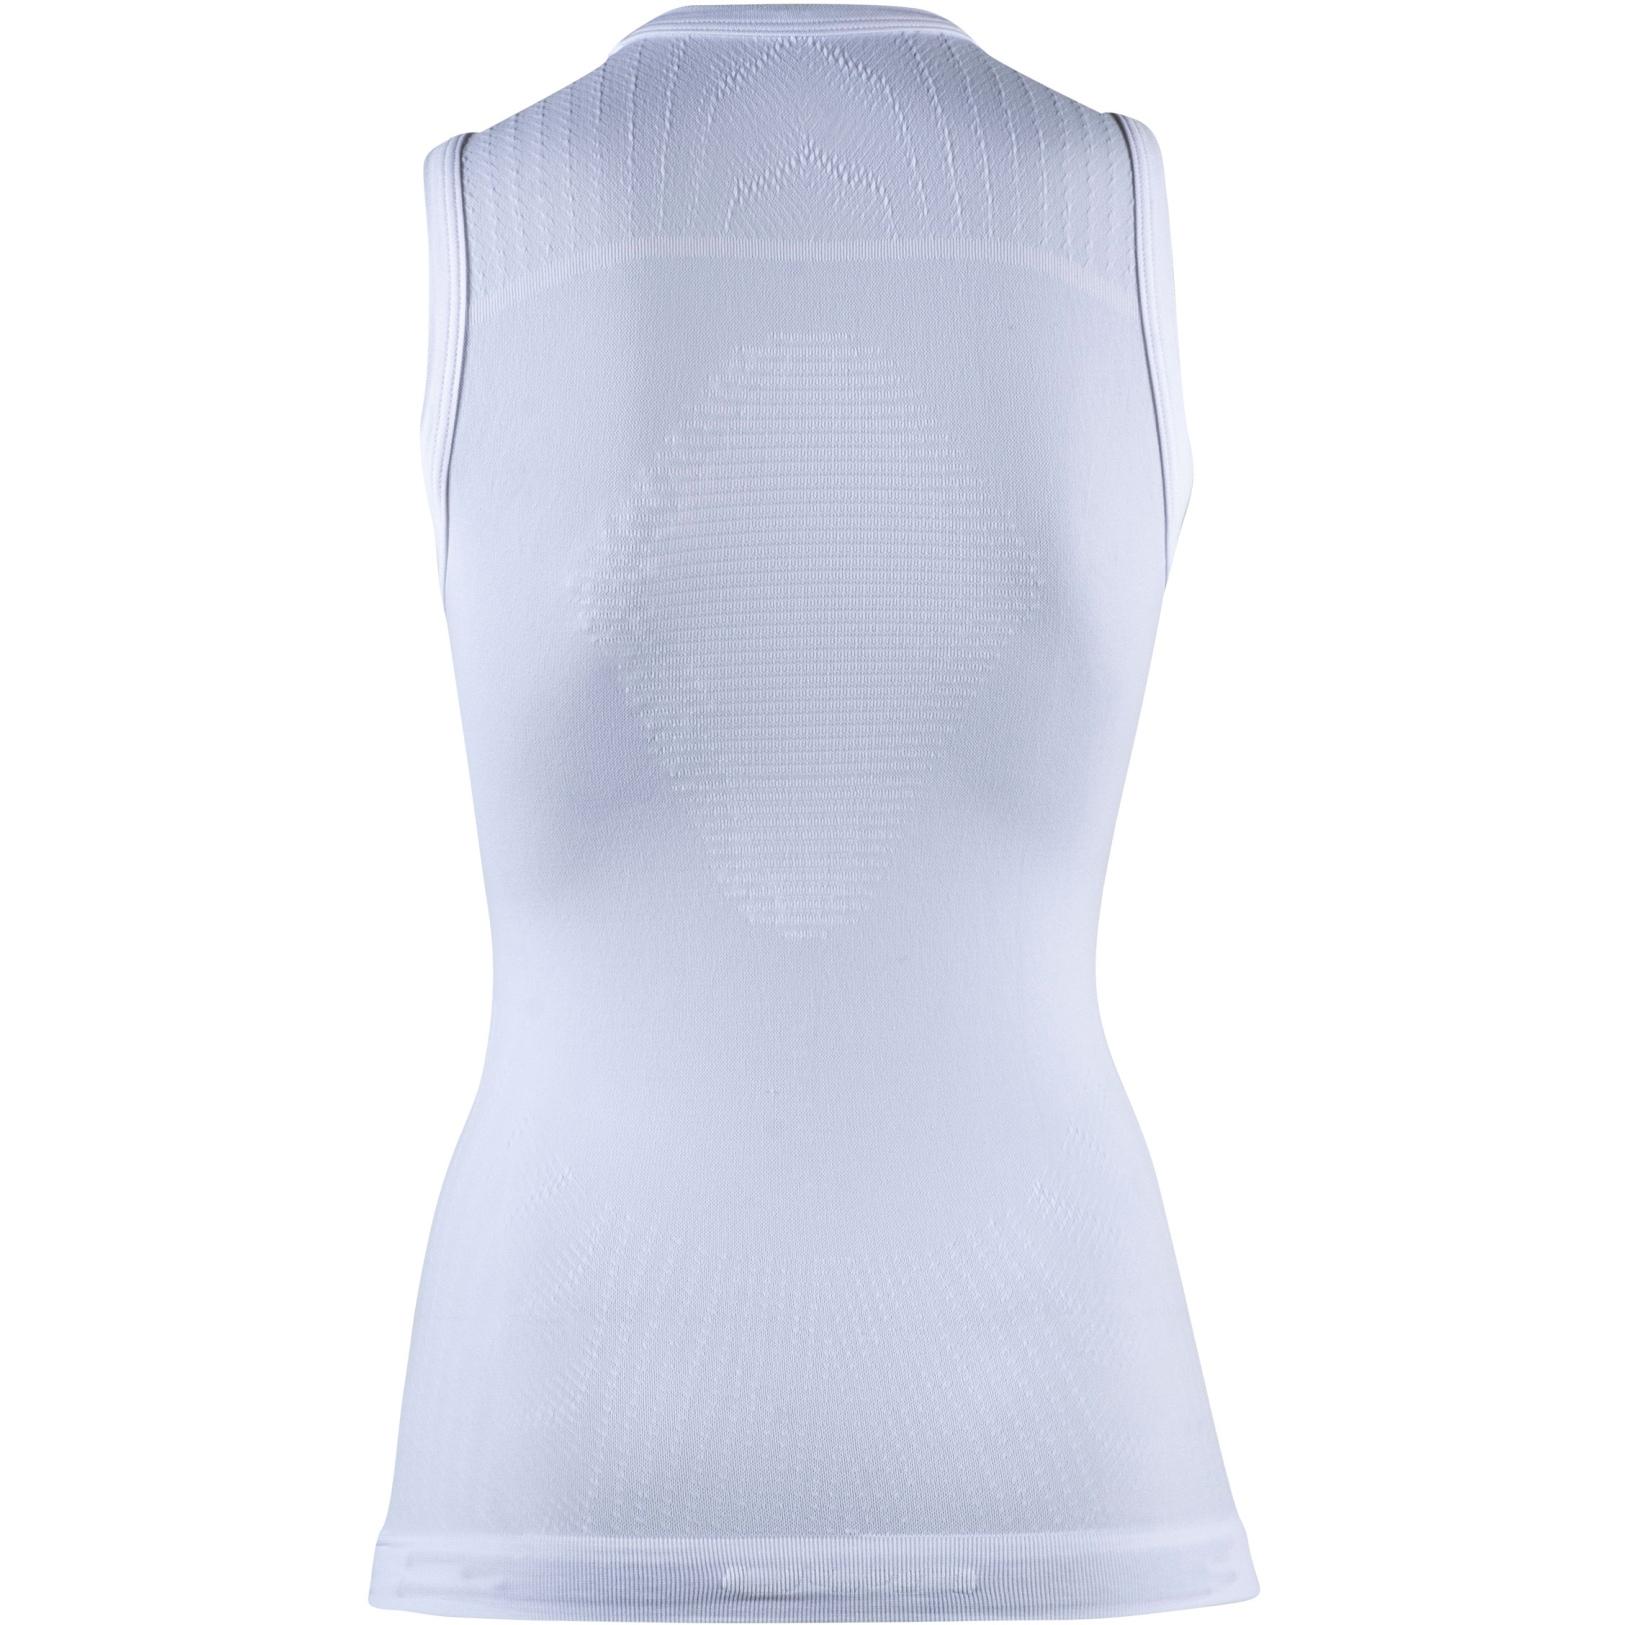 Bild von UYN Visyon Light 2.0 Damen Ärmelloses Shirt - White